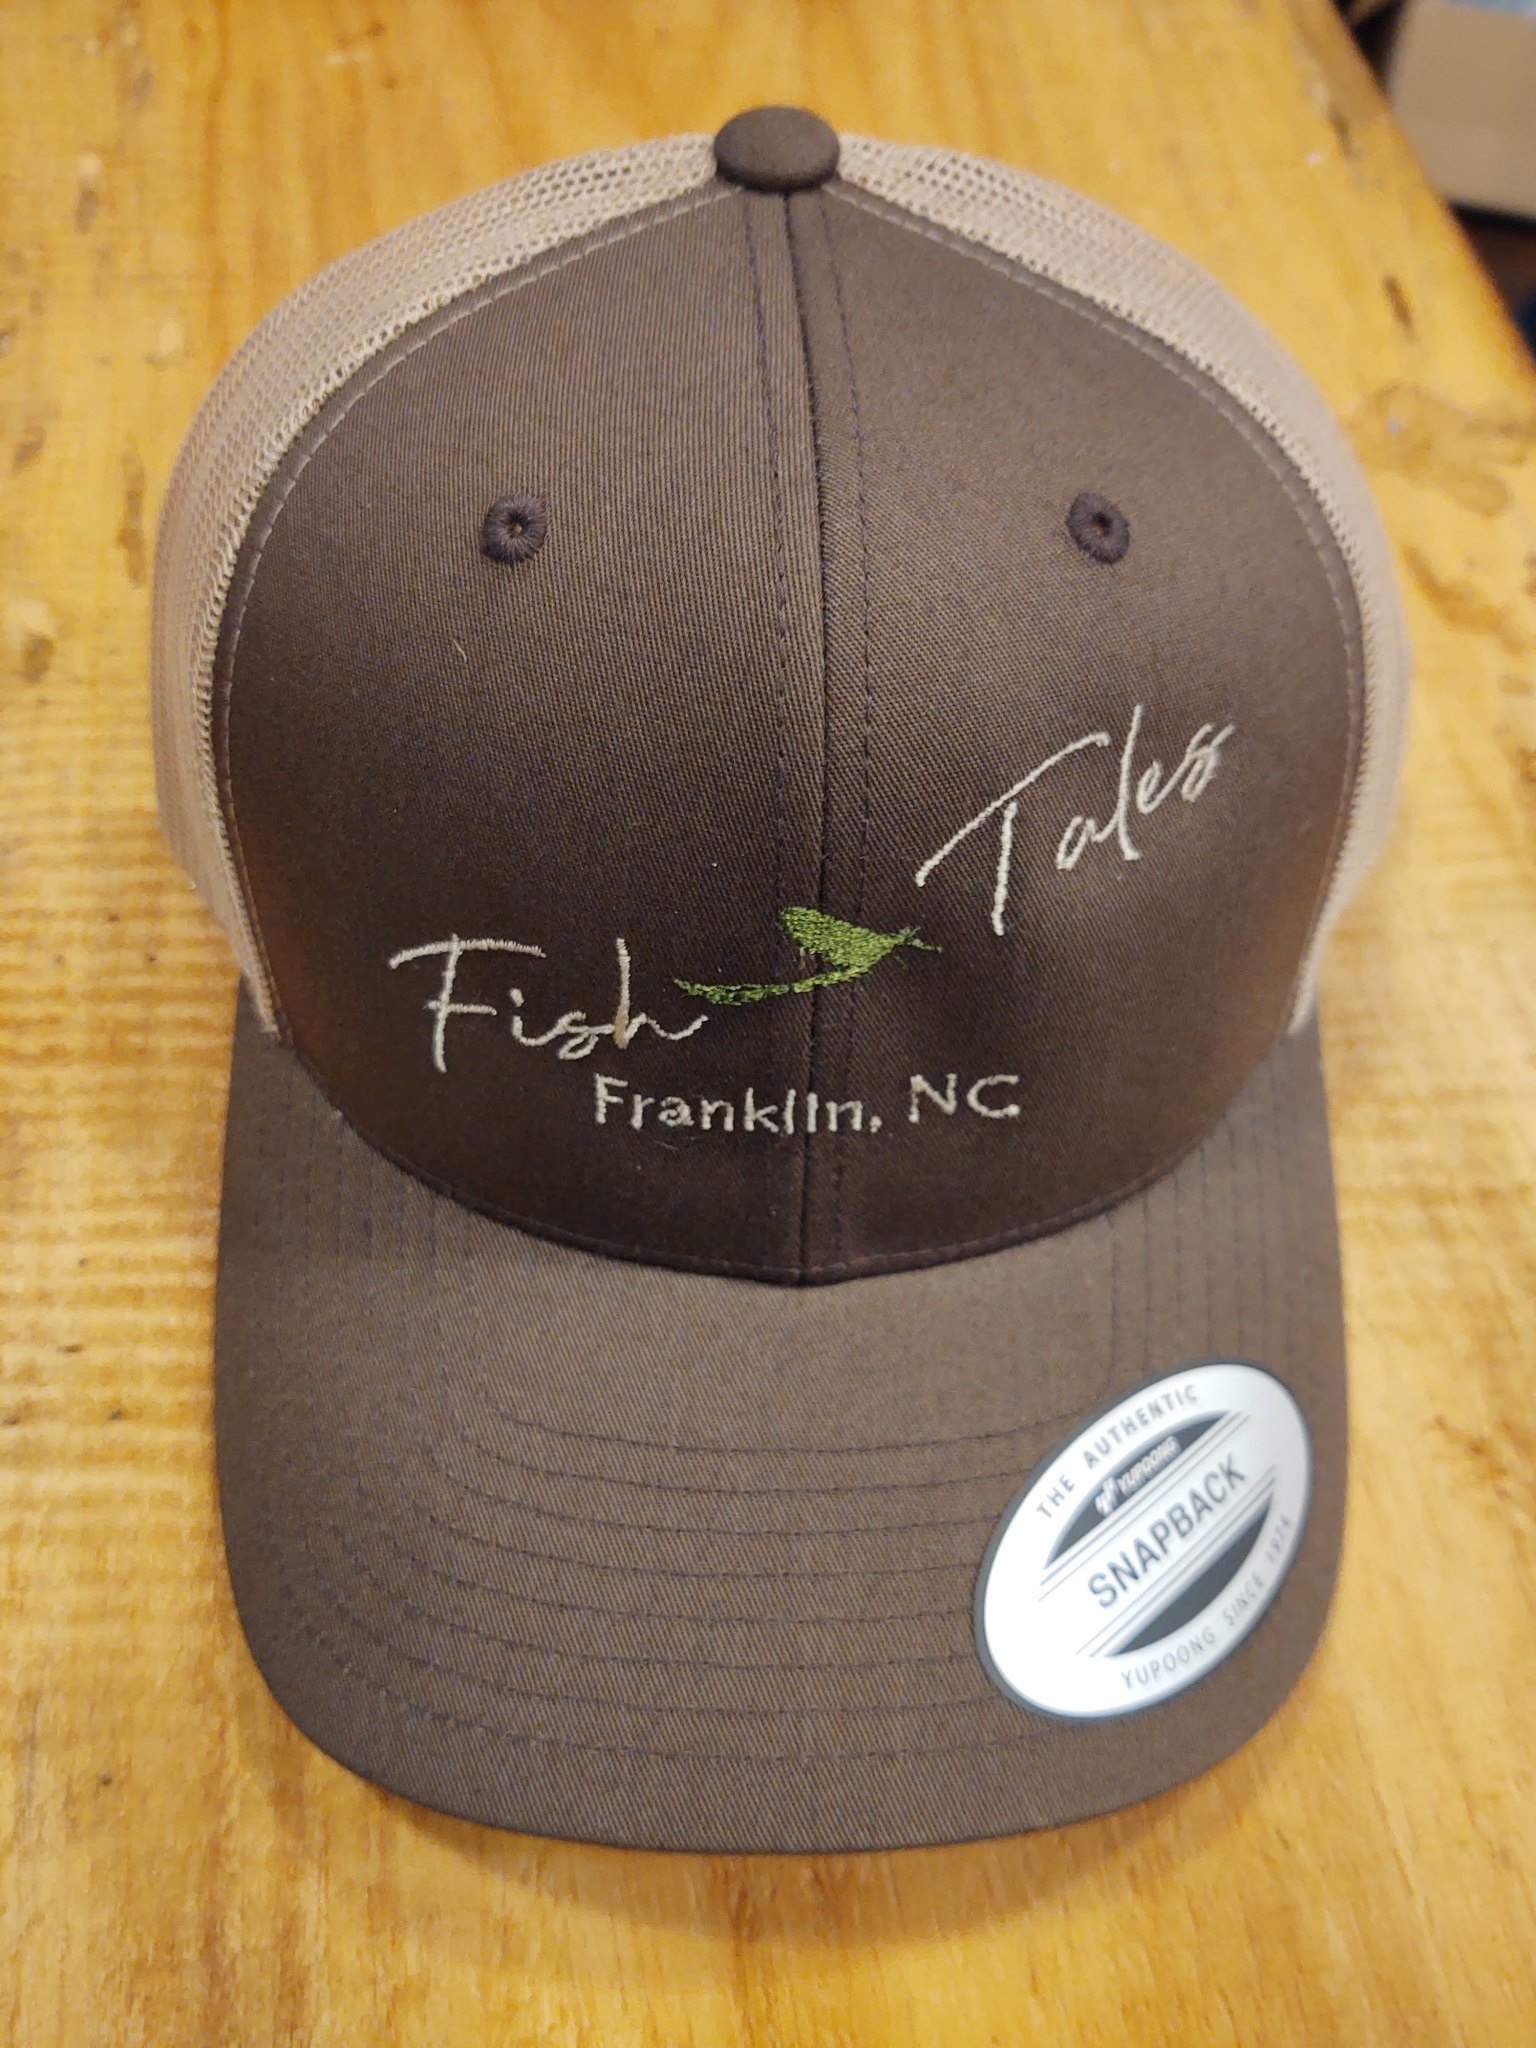 Sports Zone Fish Tales Baseball Hat  Slant logo-Brown/Lt Brown Mesh Snap Back